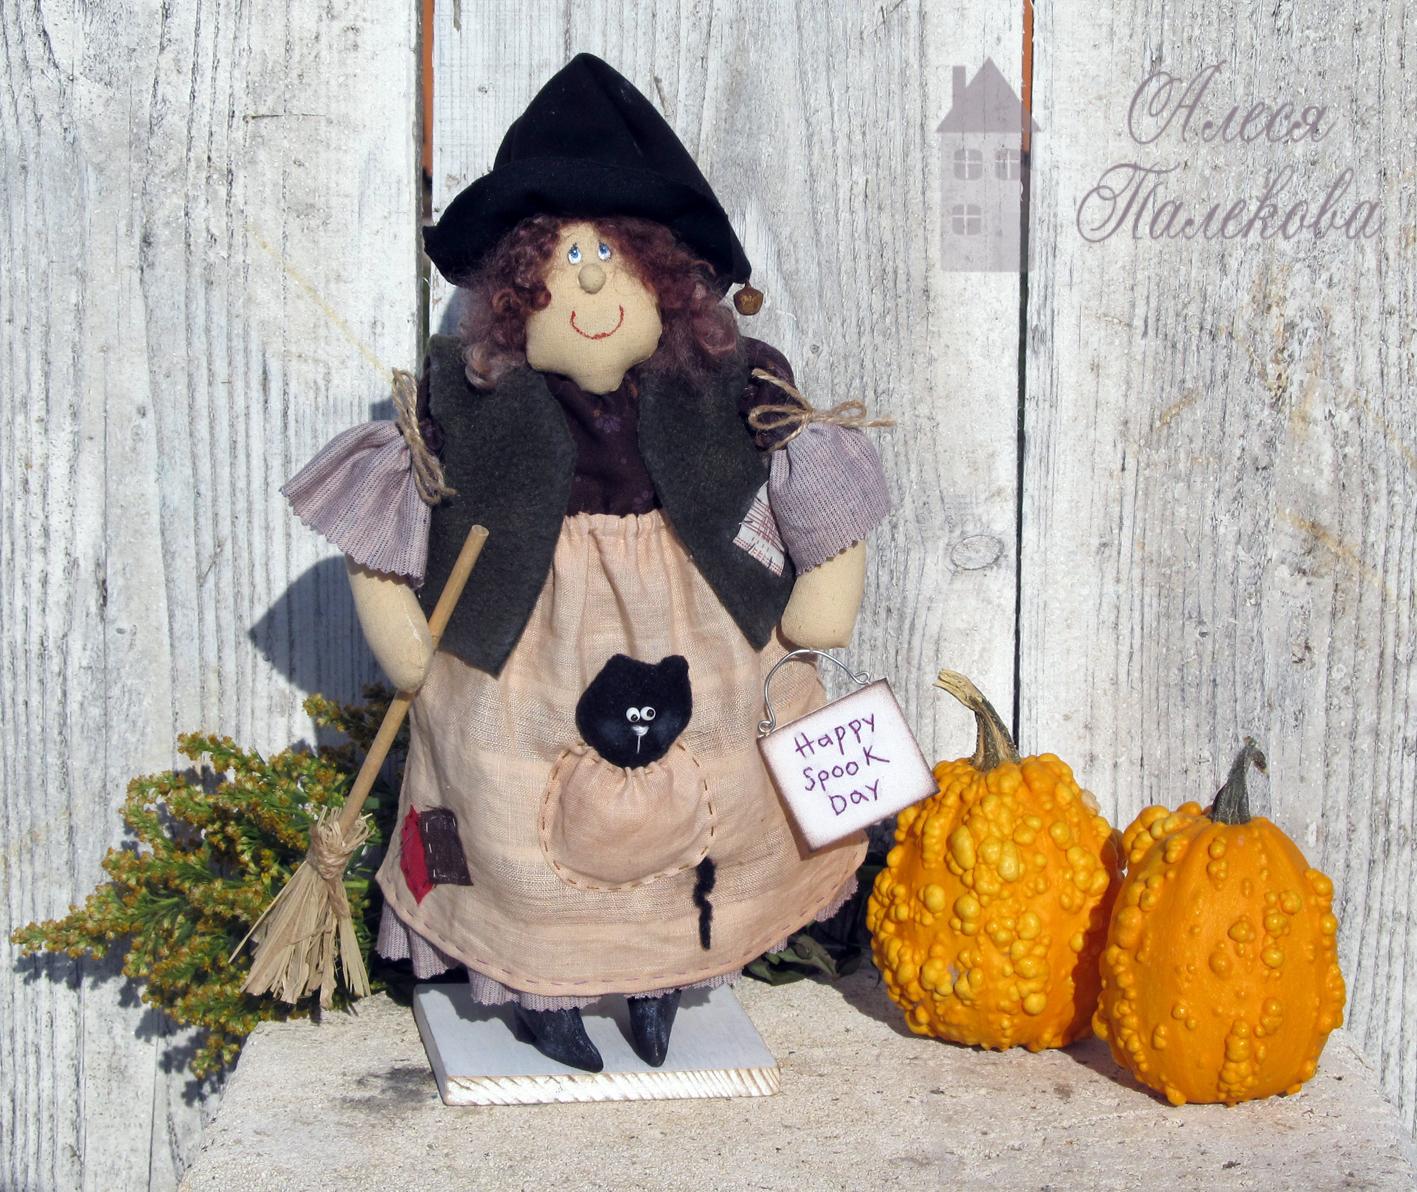 кукла-ведьмочка, хэллоуин, happy spook day, выкройка ведьмочки, Halloween